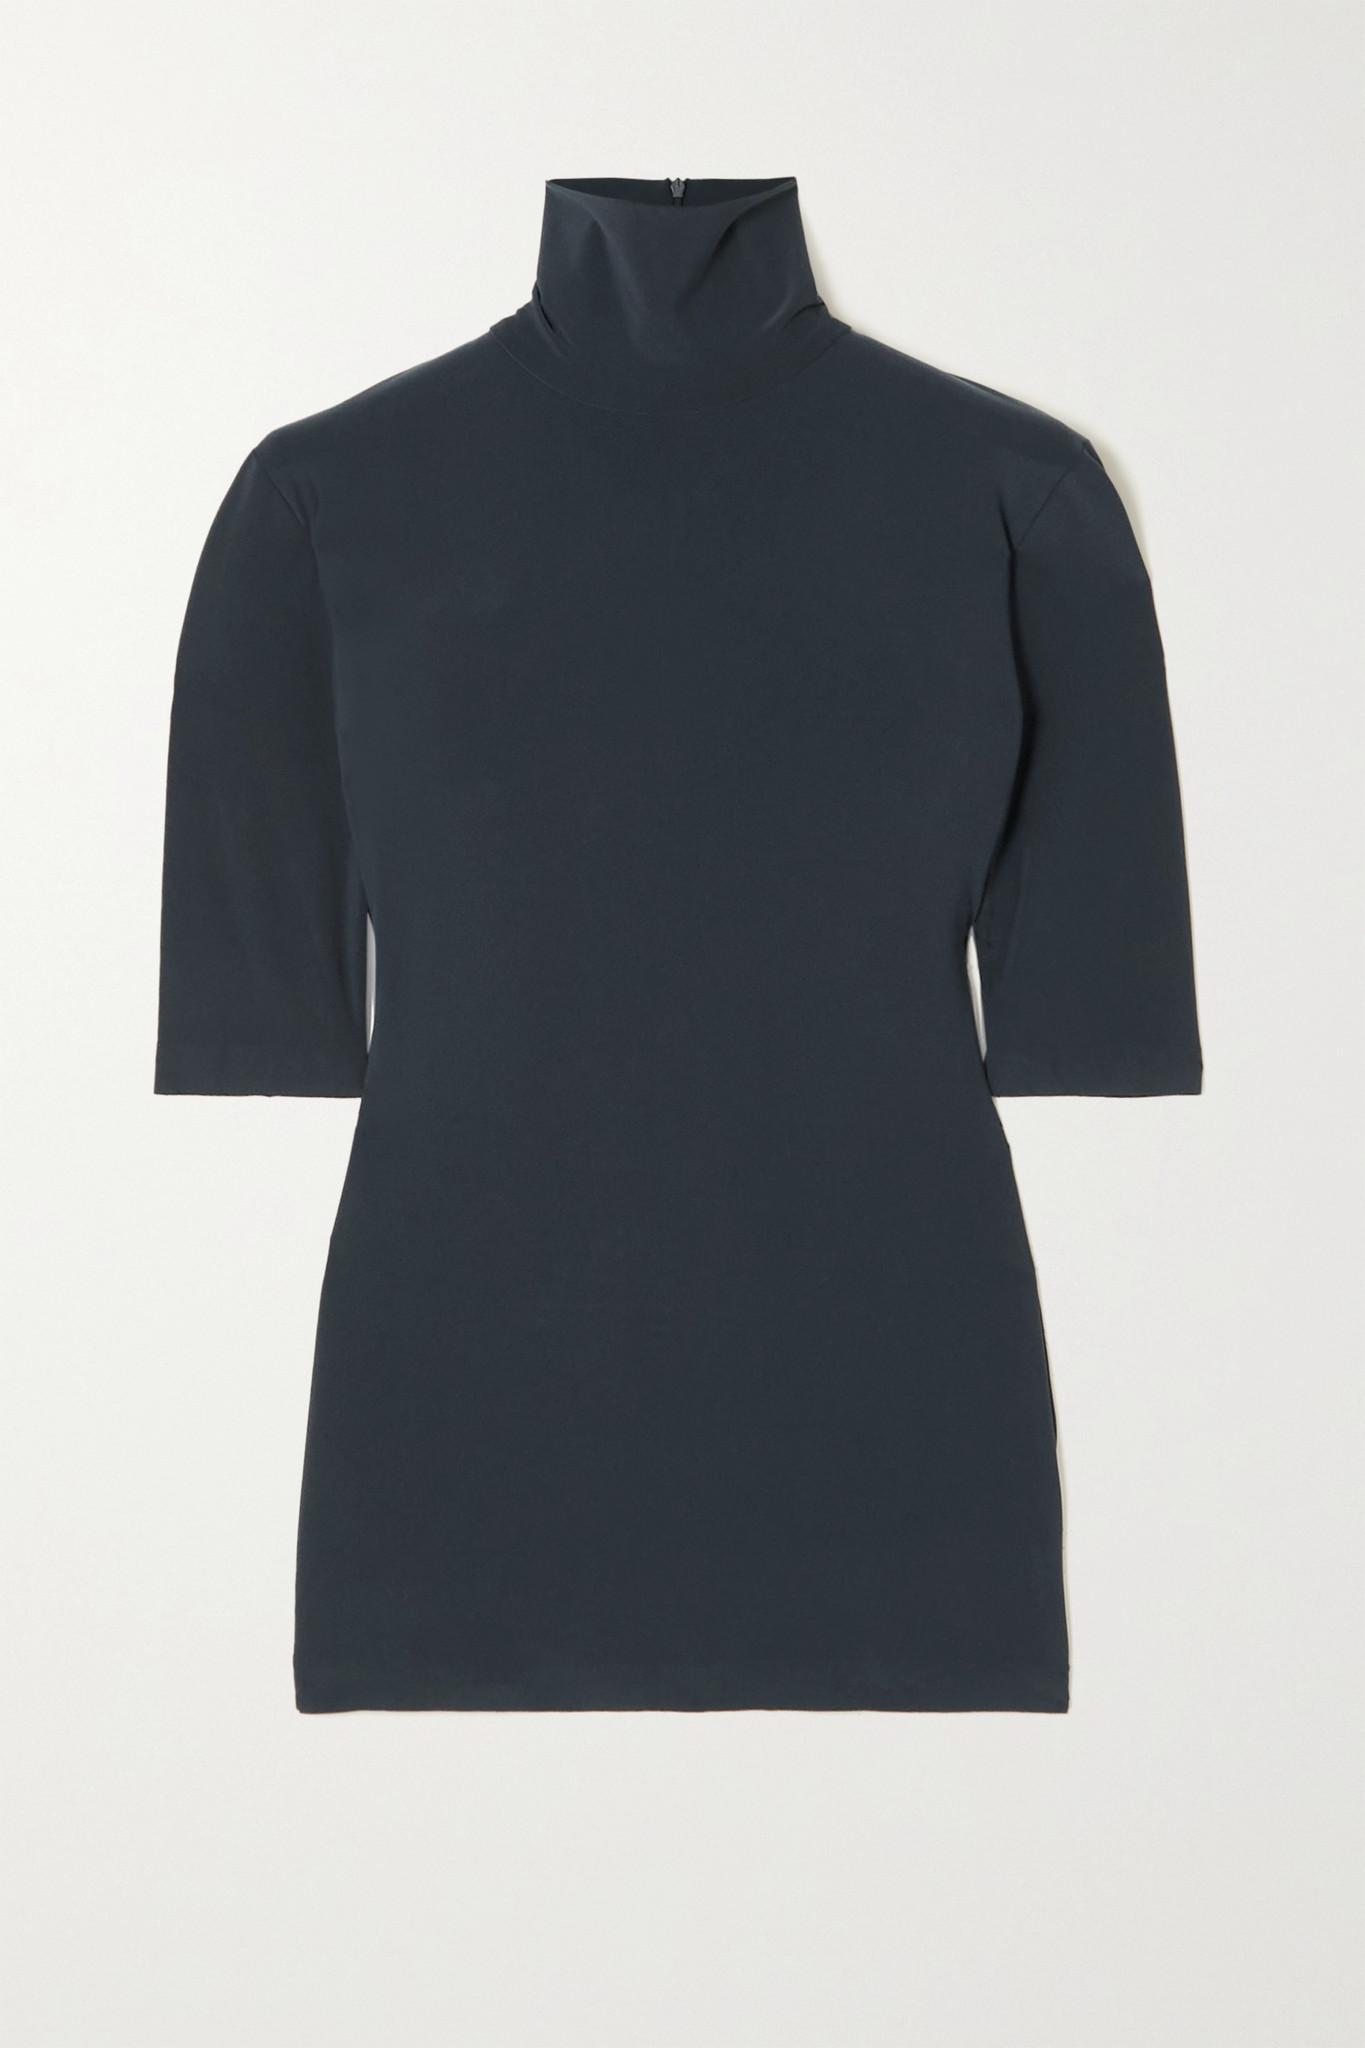 NORMA KAMALI - Stretch-jersey Turtleneck Top - Blue - small